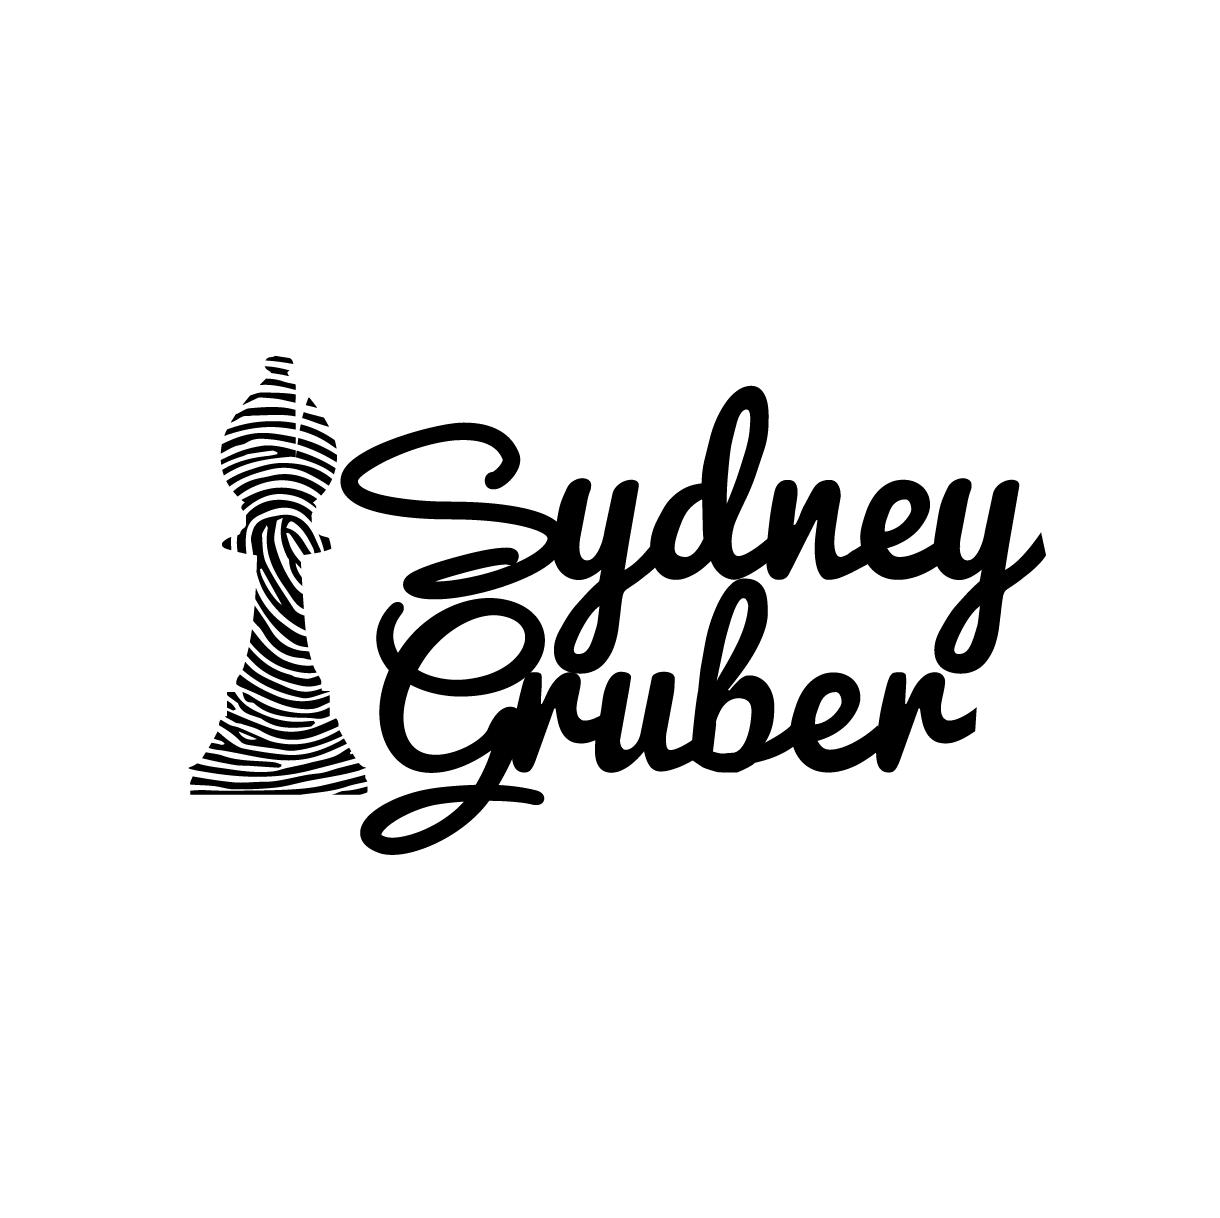 Sydney Gruber's Signature